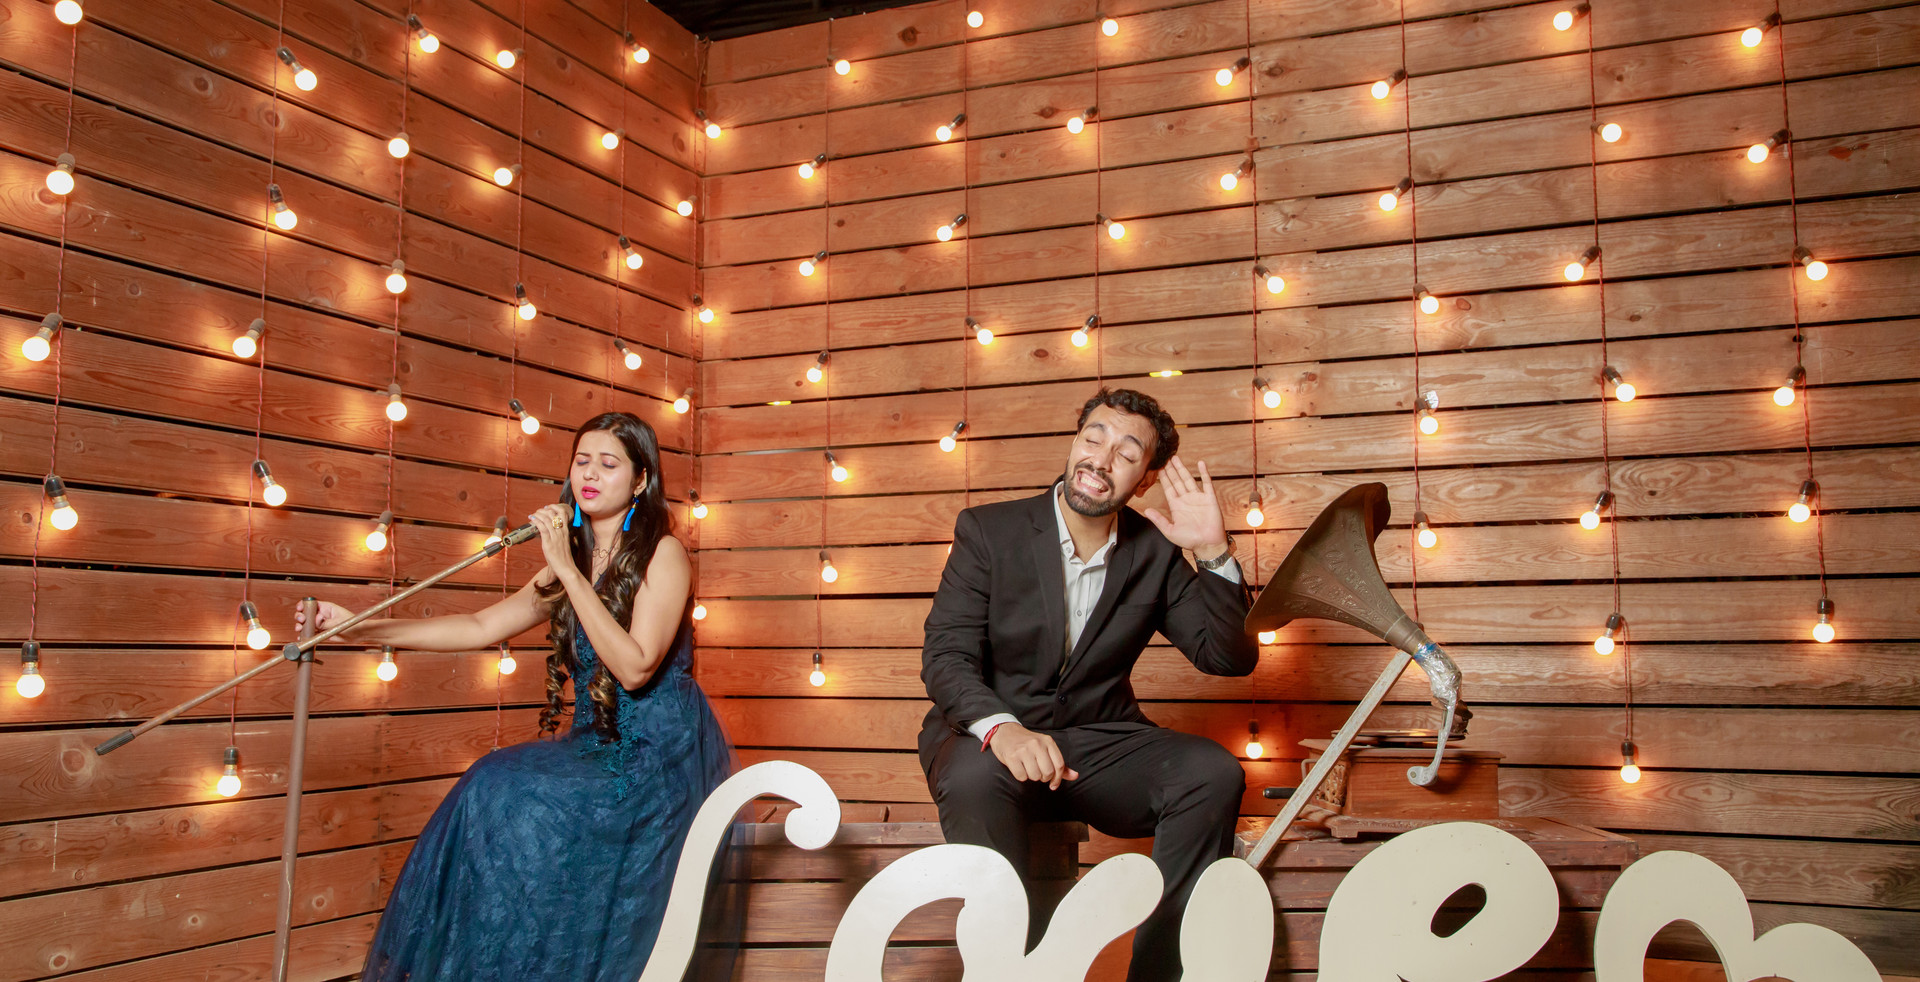 Pre-wedding - Shooting sky studio